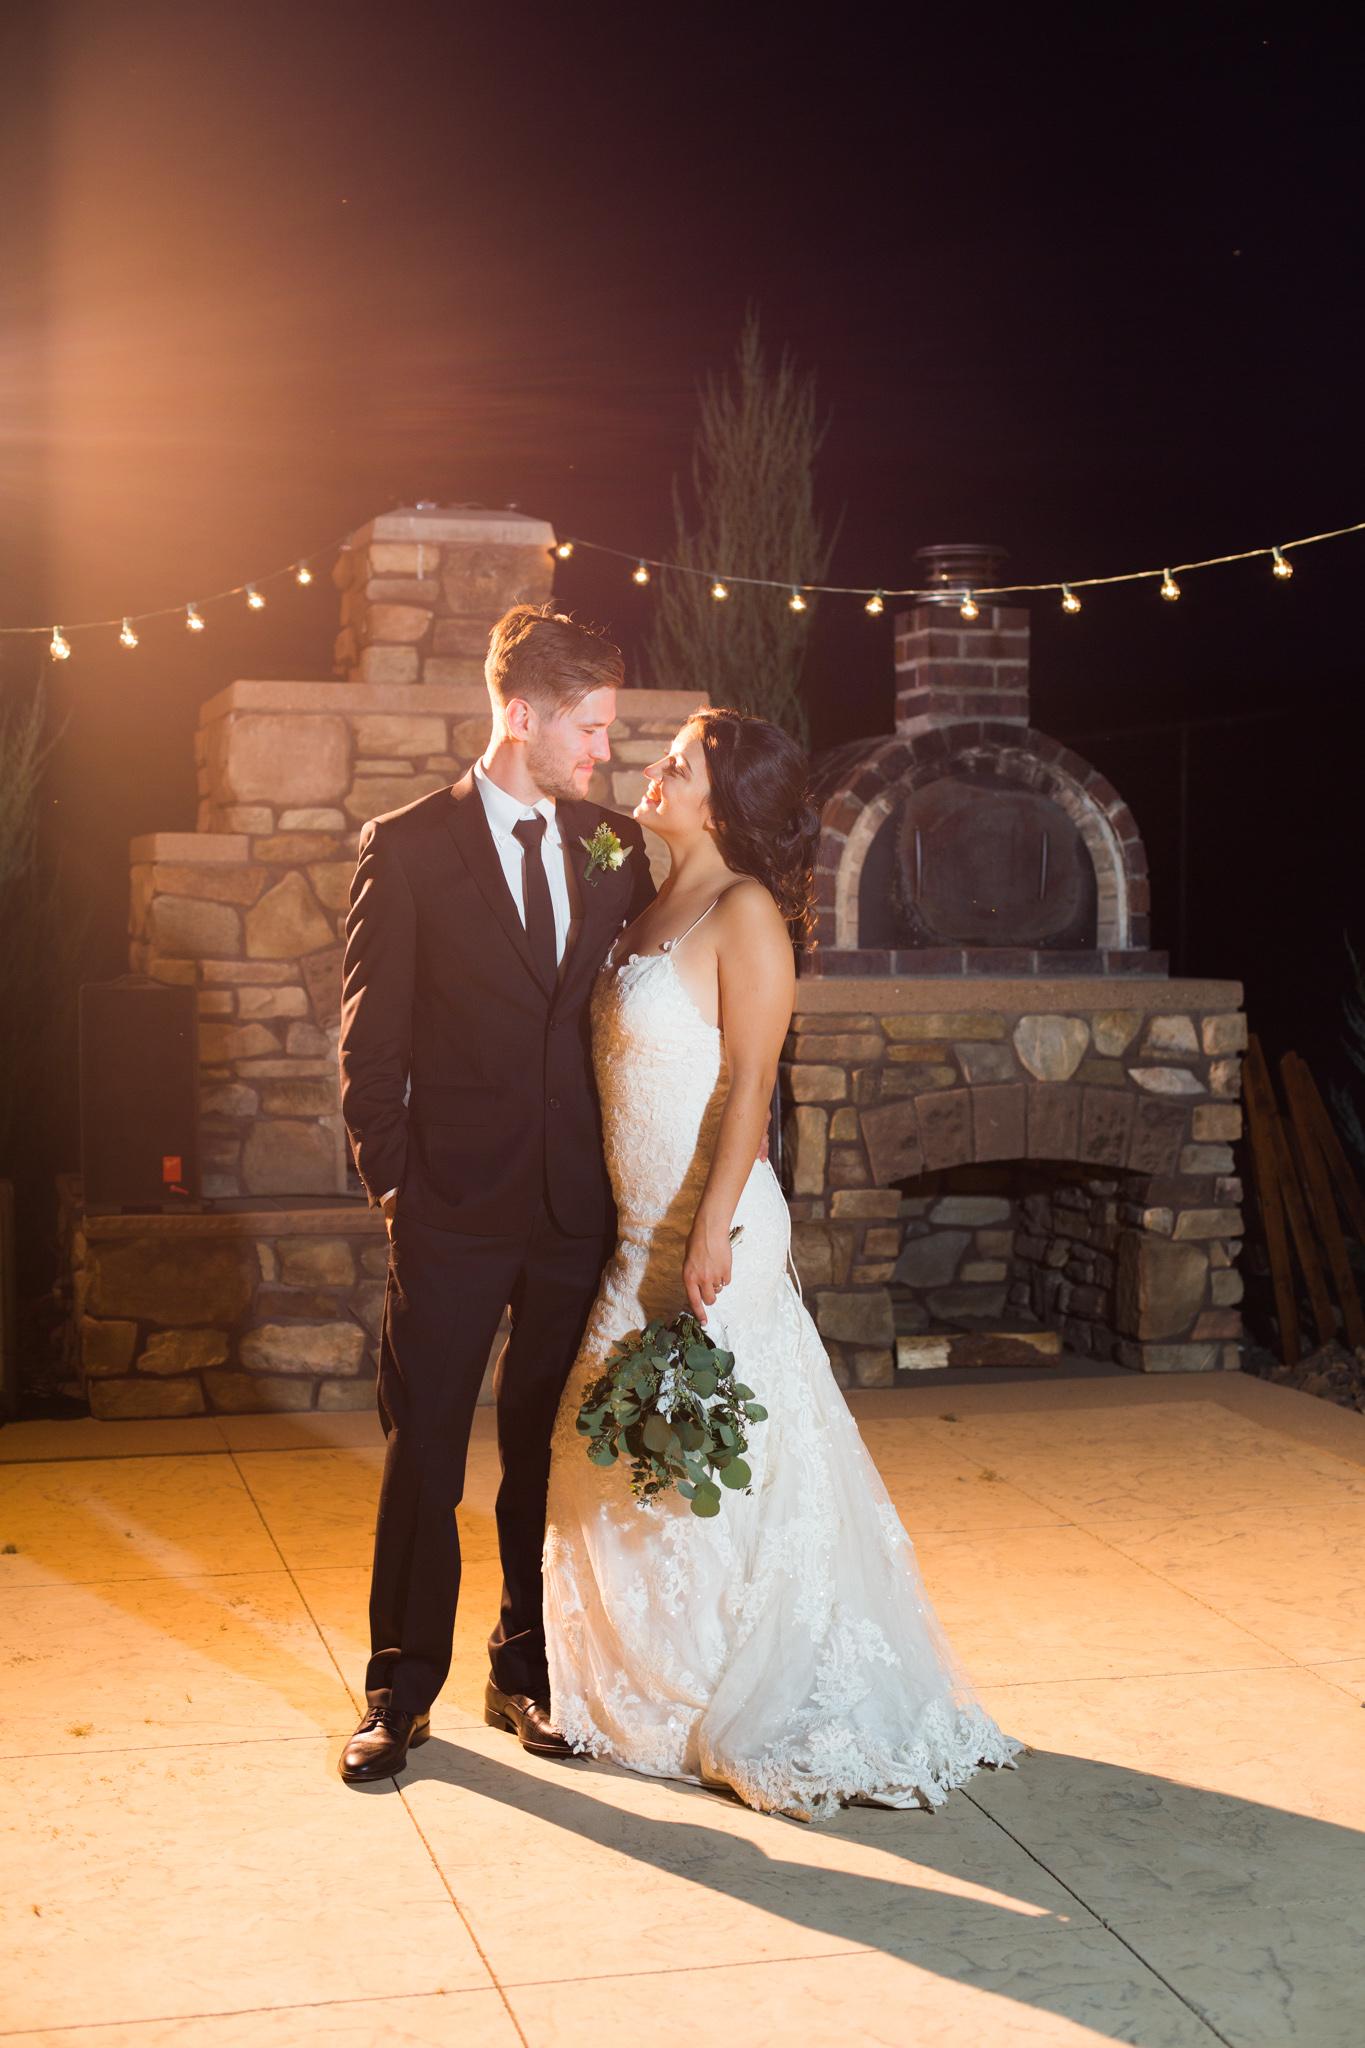 Olga_janni_wedding_090917_WEBSIZE (640 of 704).JPG